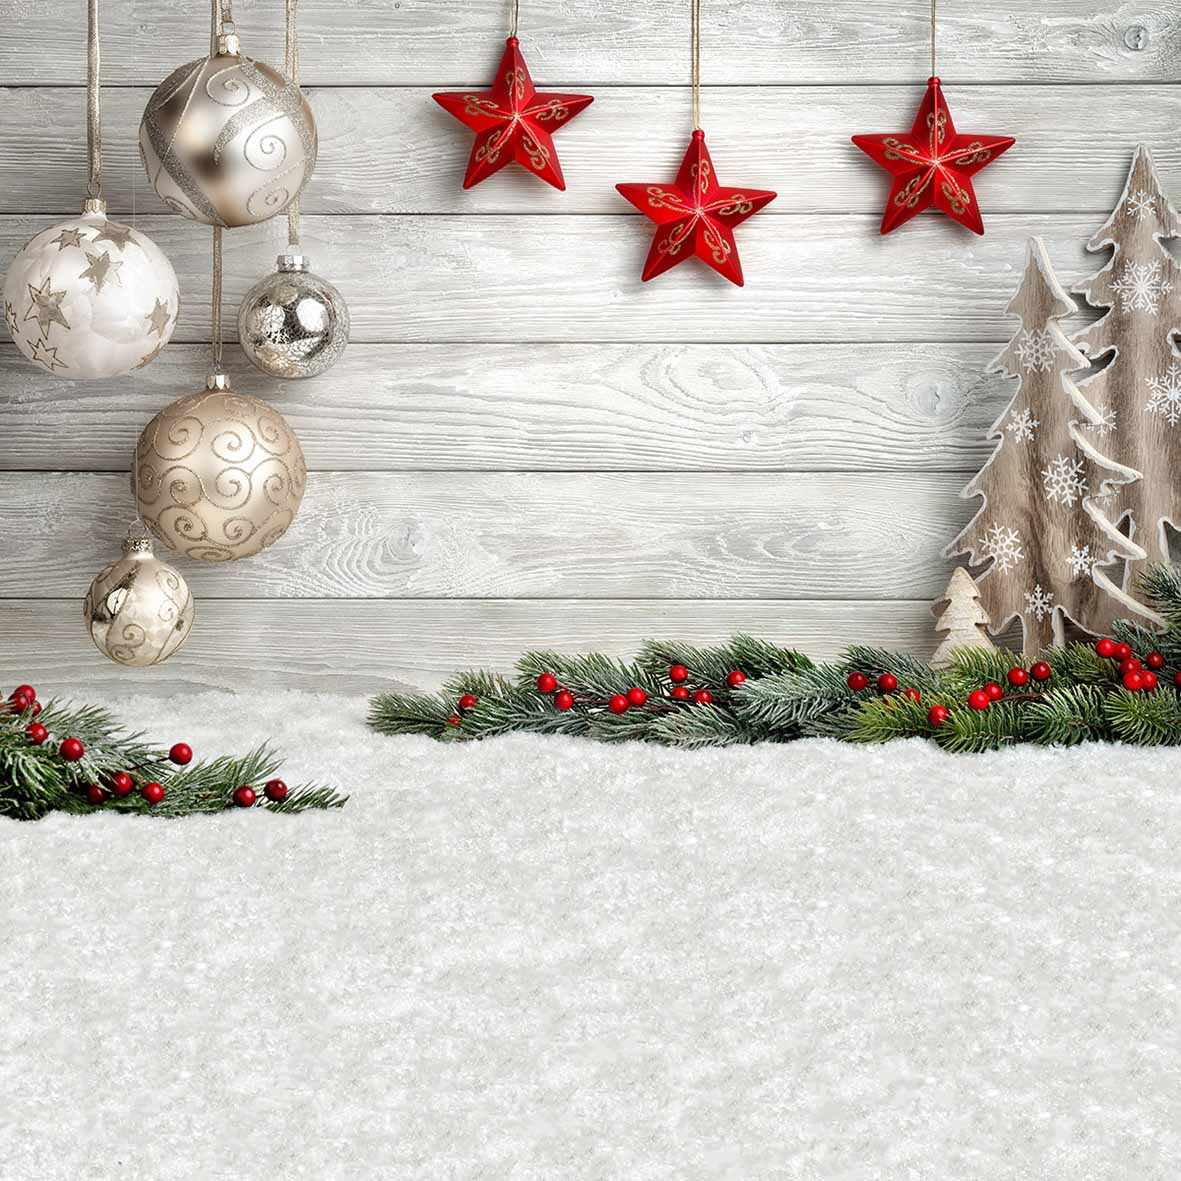 Christmas Backround.Allenjoy Christmas Background Photography Ball Stars Child White Wooden Tree Decoration Photographic Photocall Navidad Backdrop